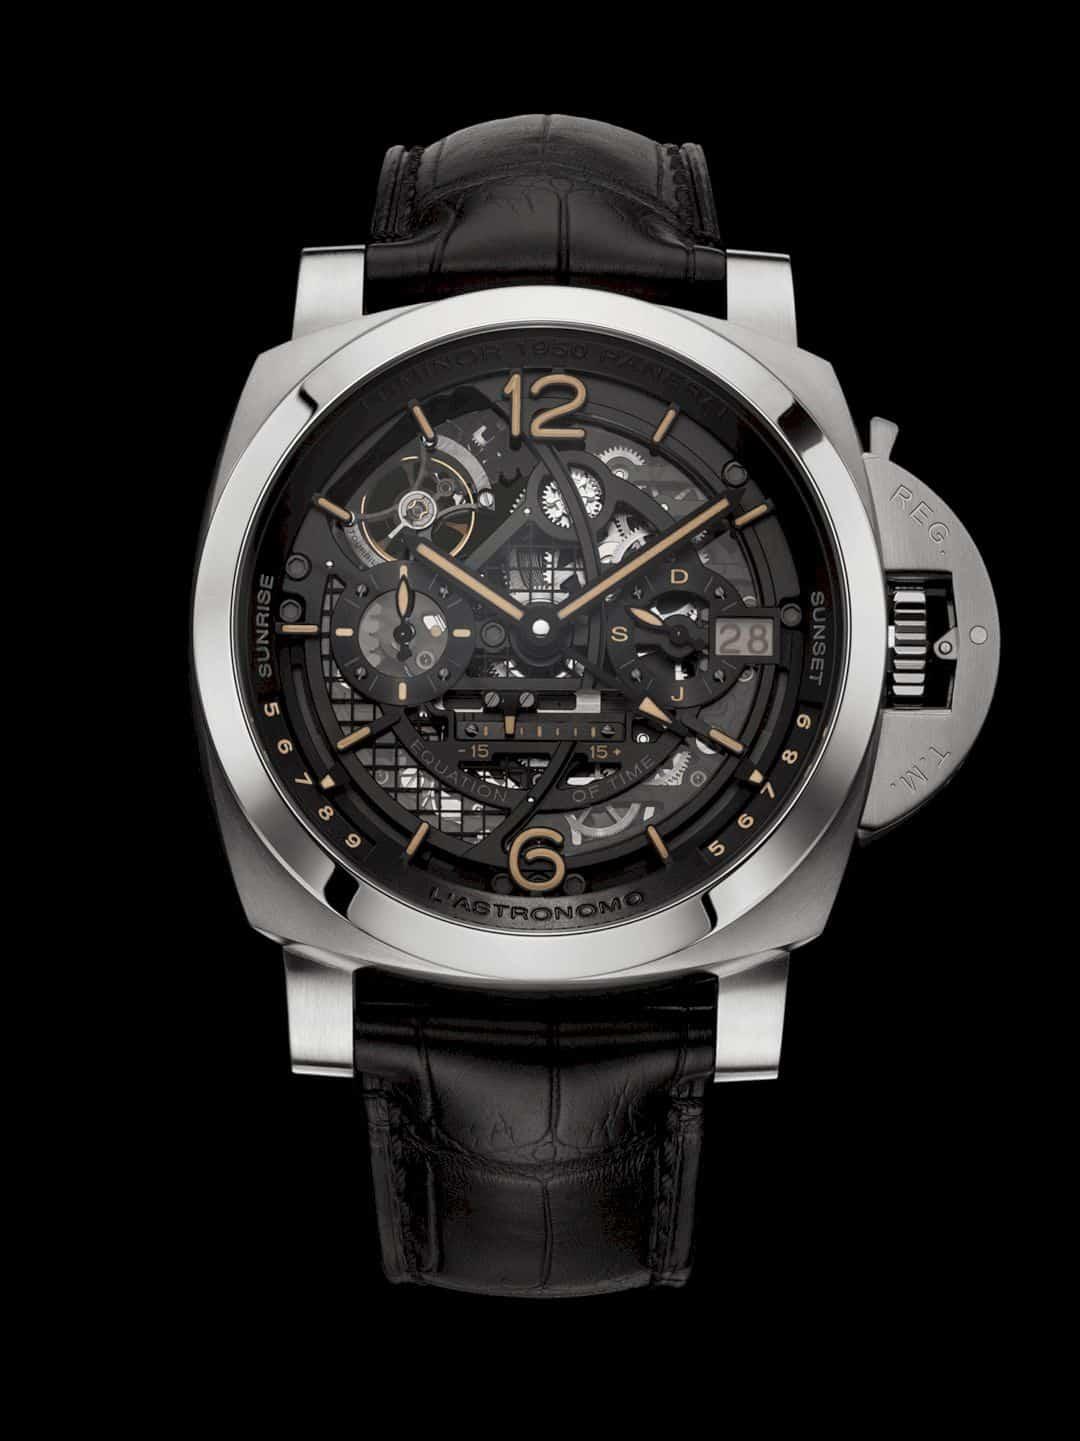 L'Astronomo Luminor 1950 Tourbillon Watch 1